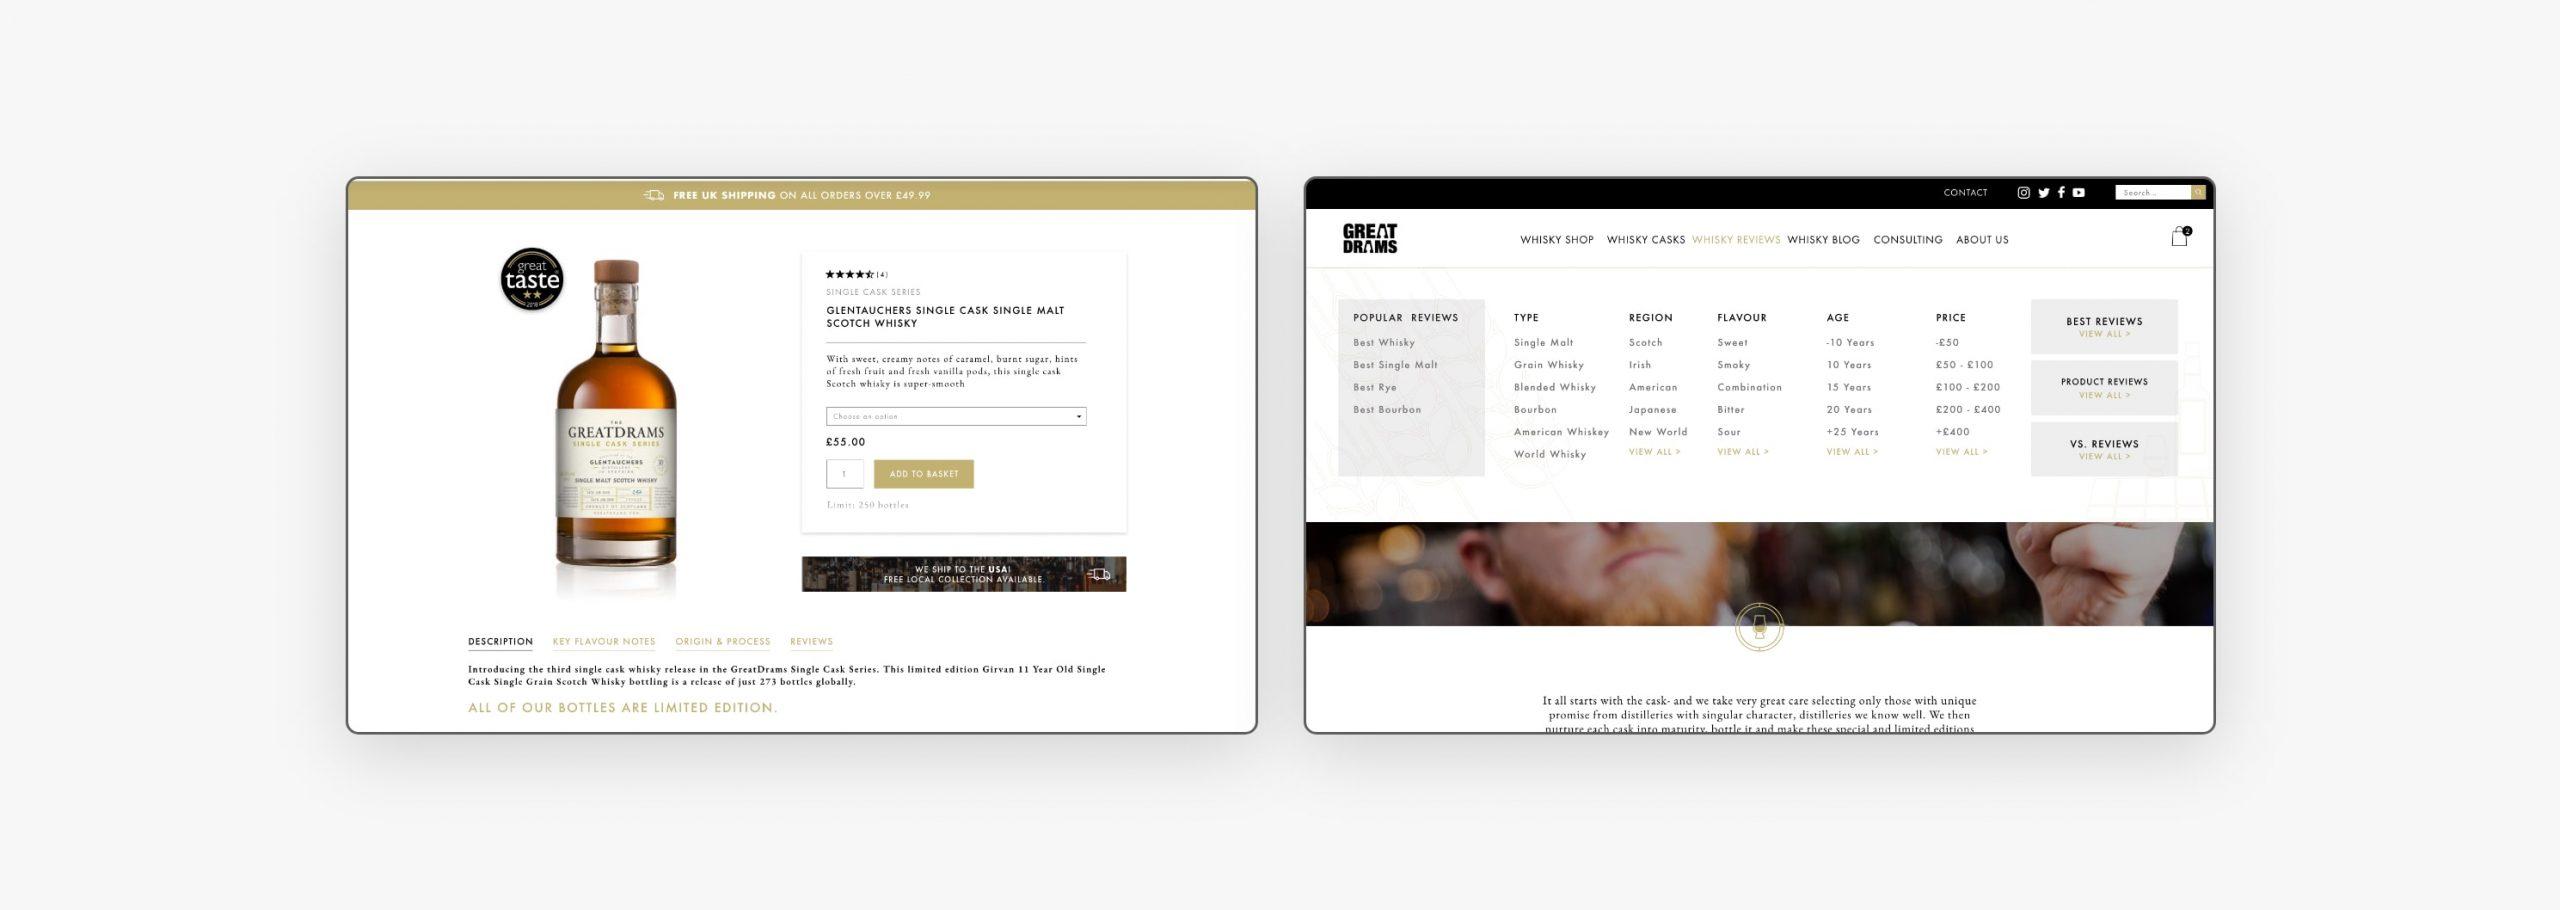 Web Design  - GD